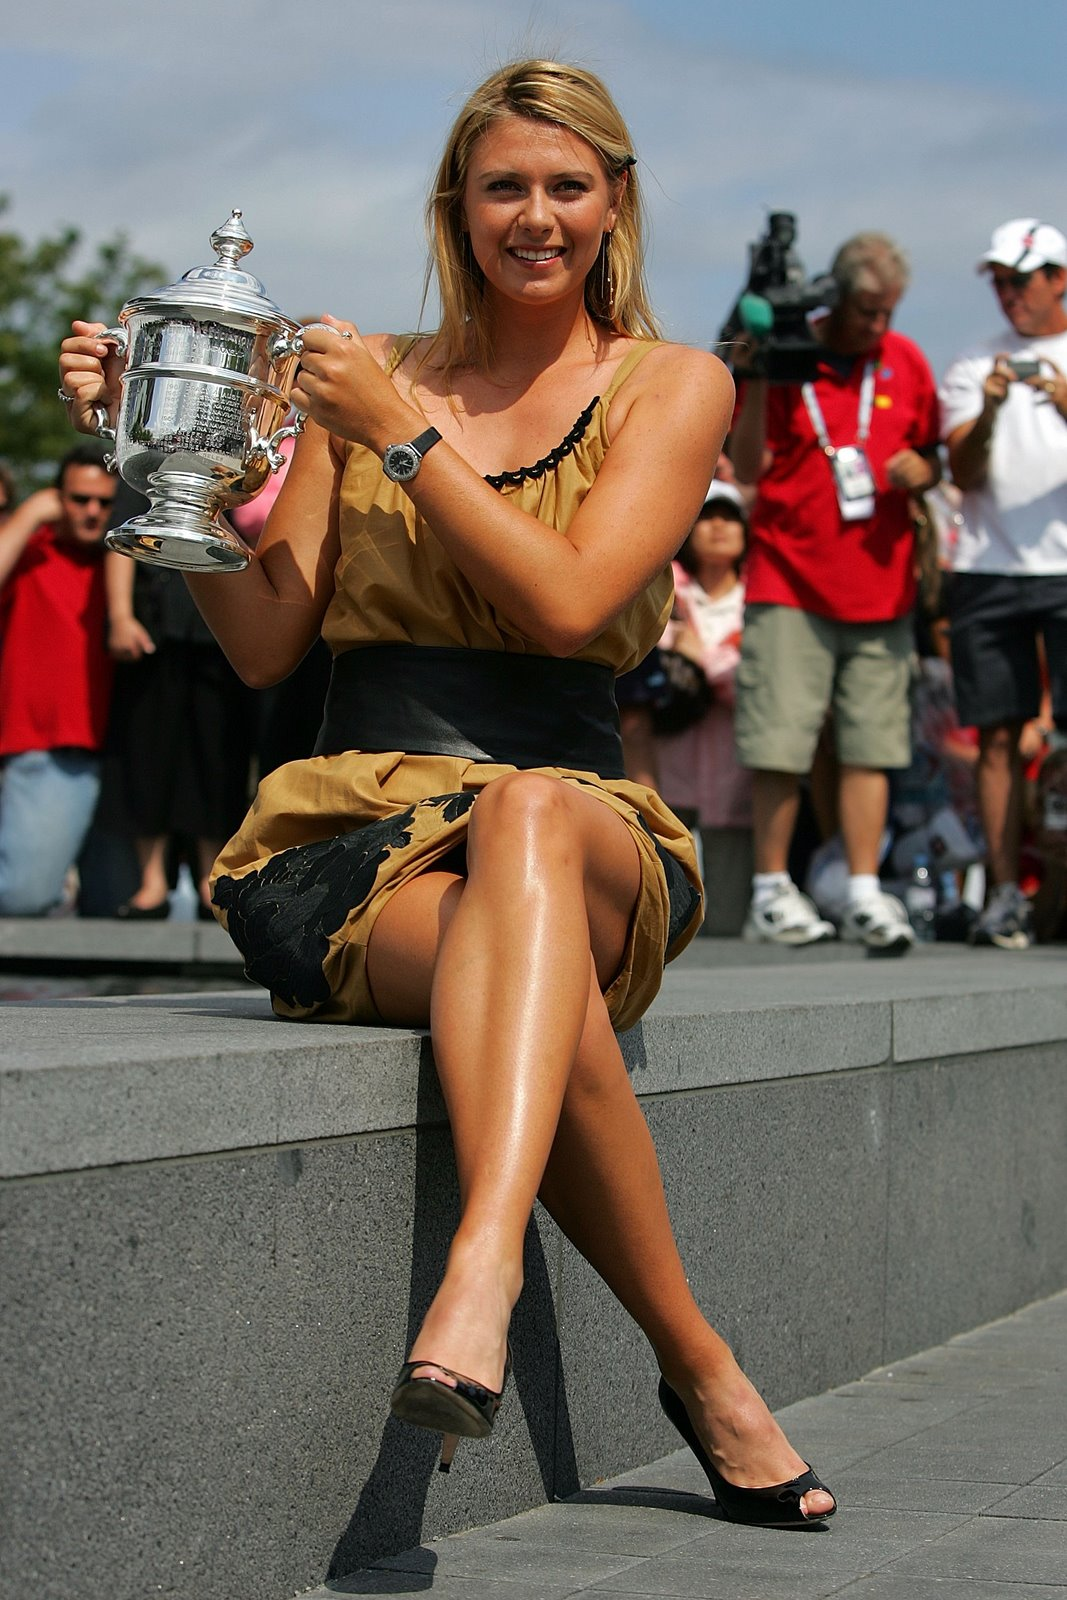 http://4.bp.blogspot.com/_auA_TzZloGs/ShLmg698wLI/AAAAAAAABi8/MSDhO6vewqU/s1600/sexy-maria-sharapova-legs-4.jpg